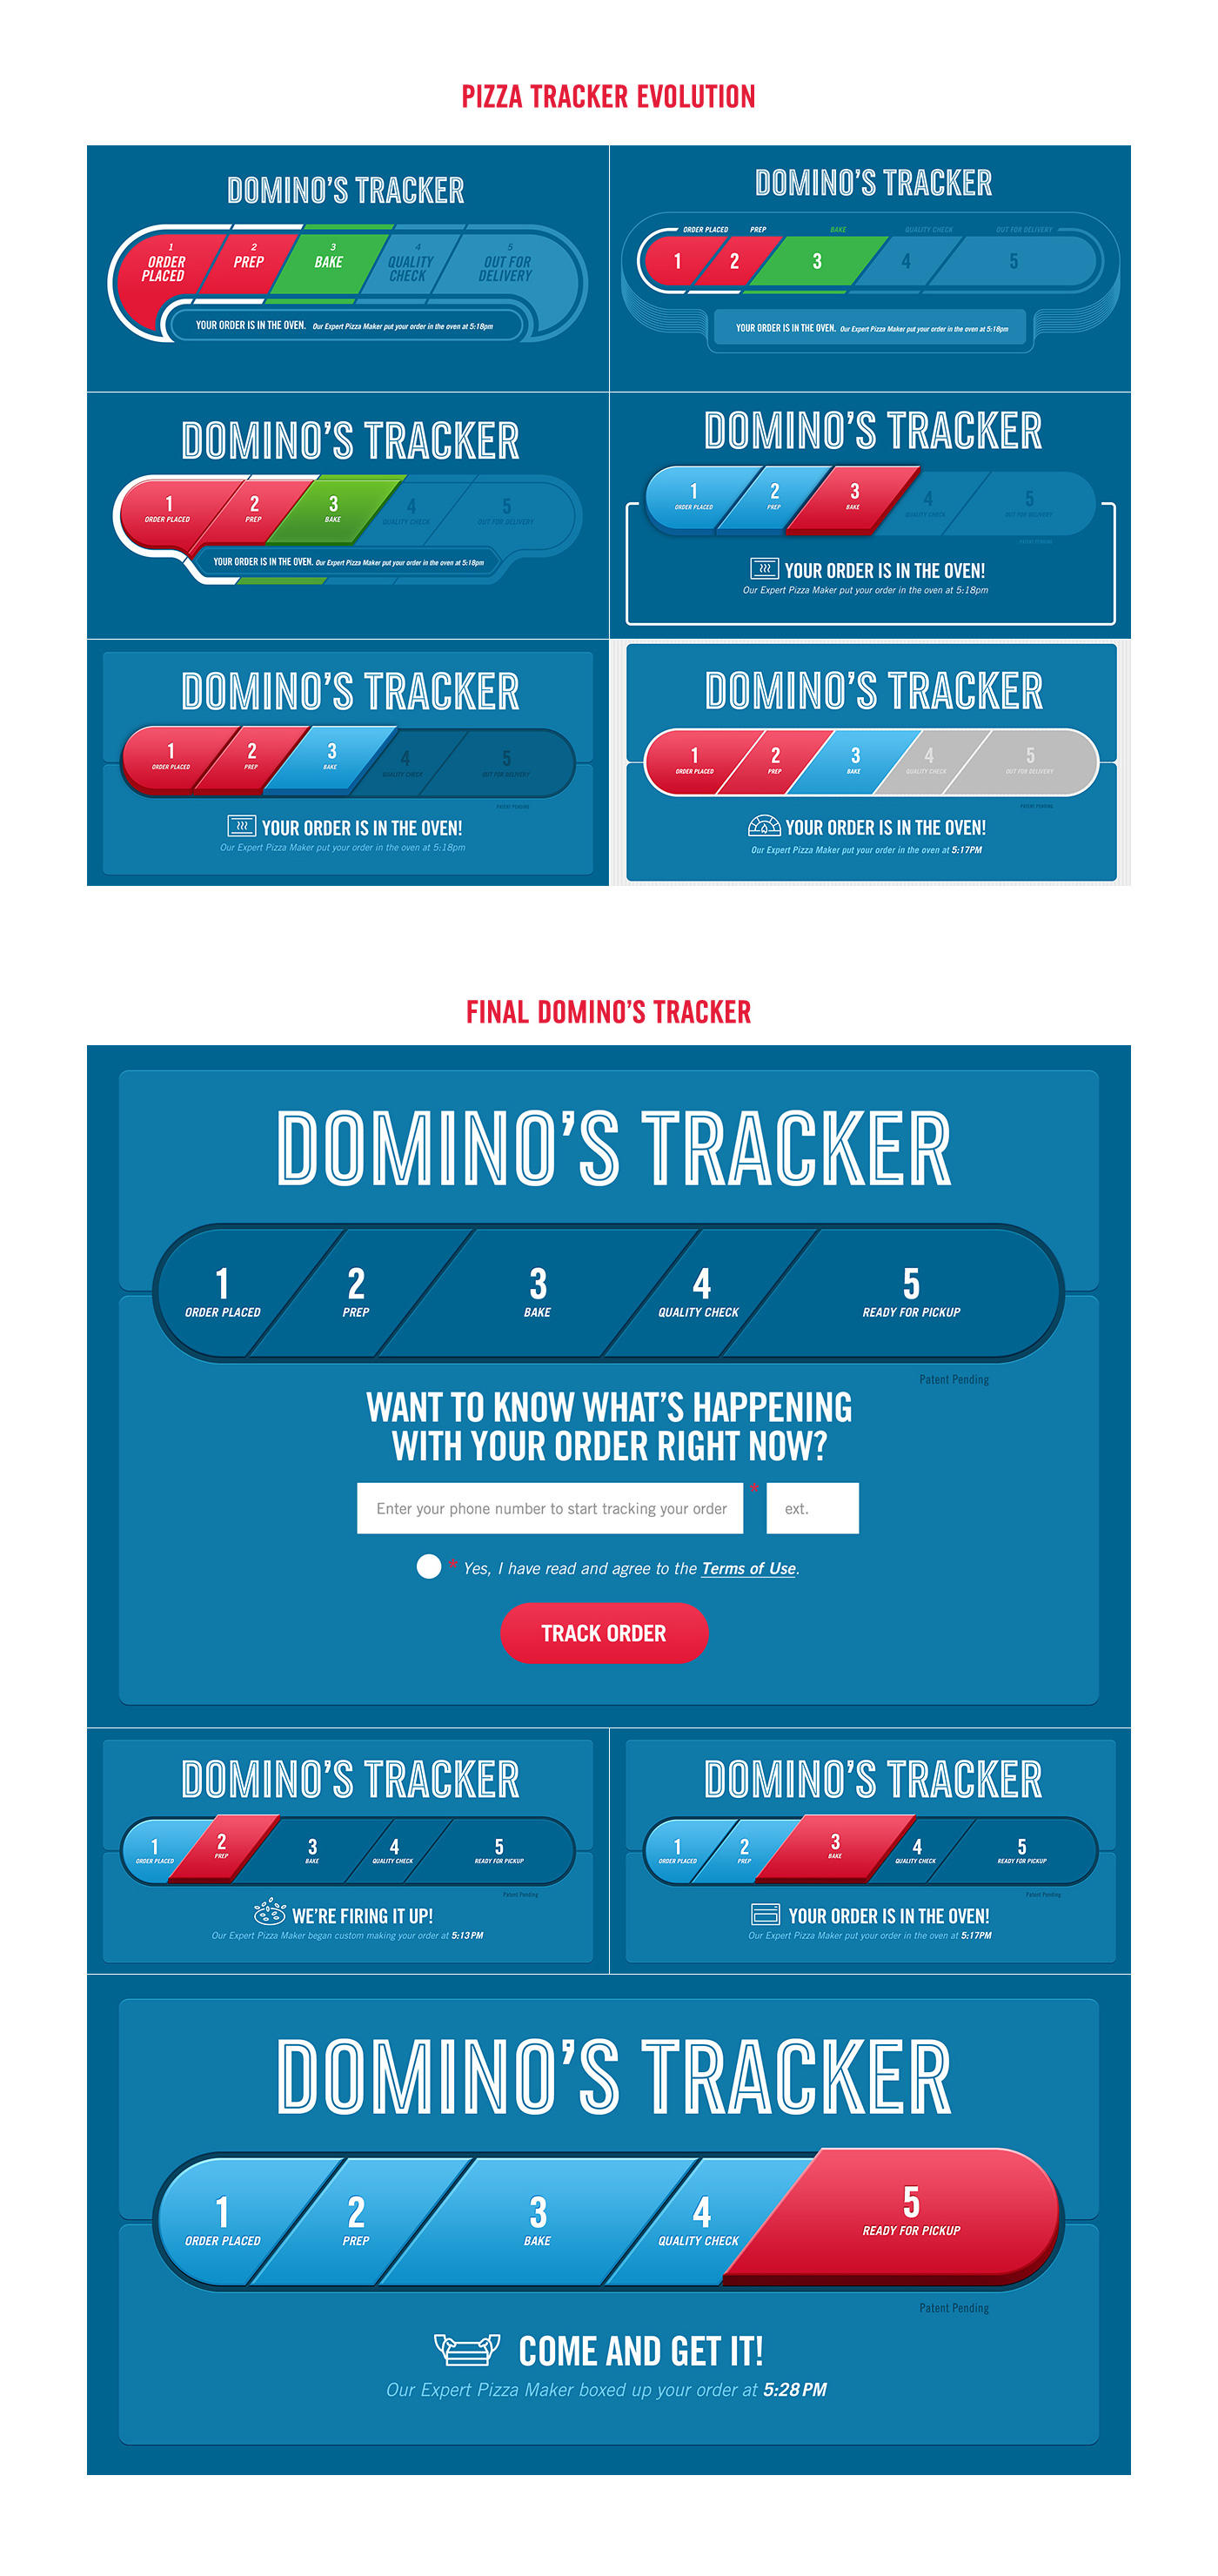 doms-tracker